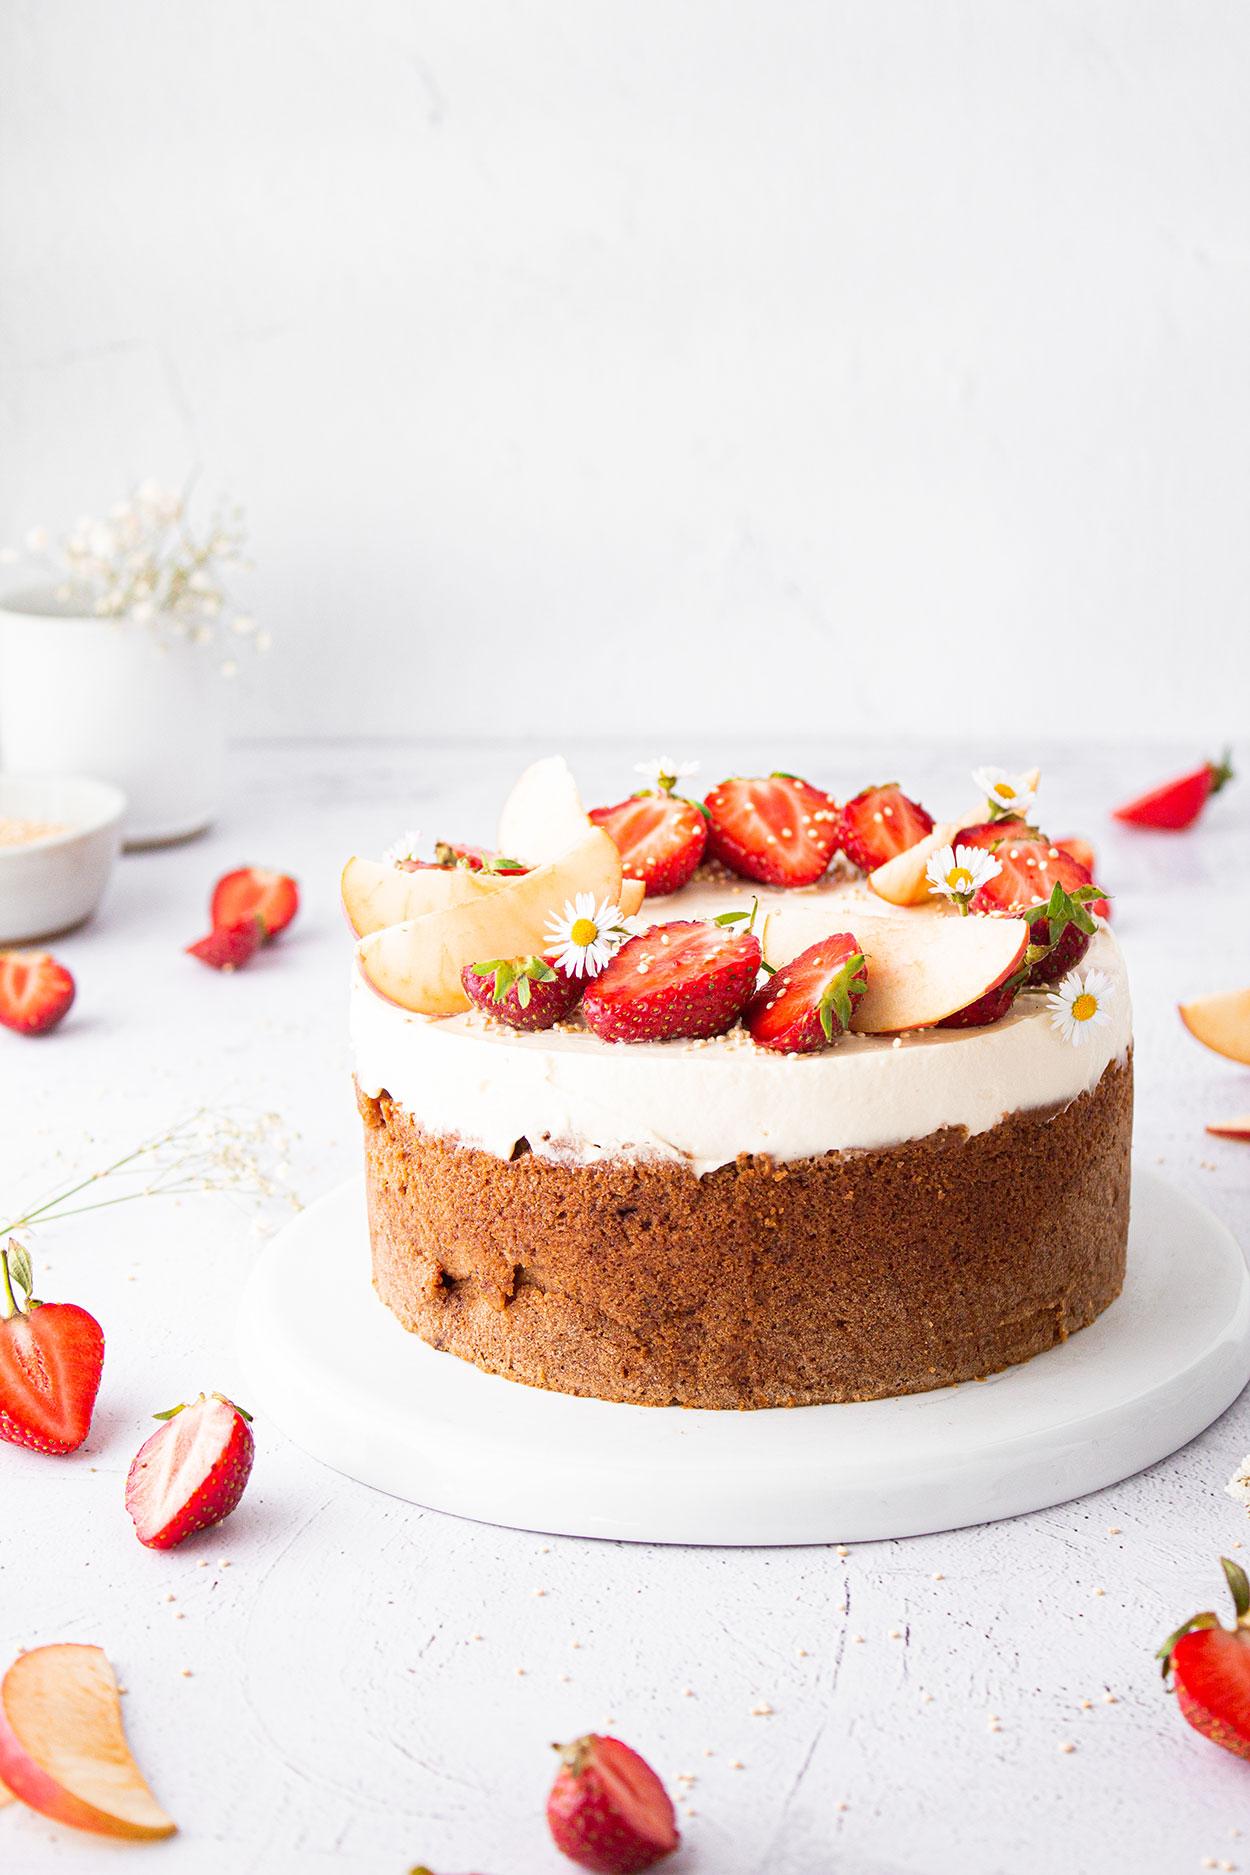 Chai Erdbeer Apfel Kuchen